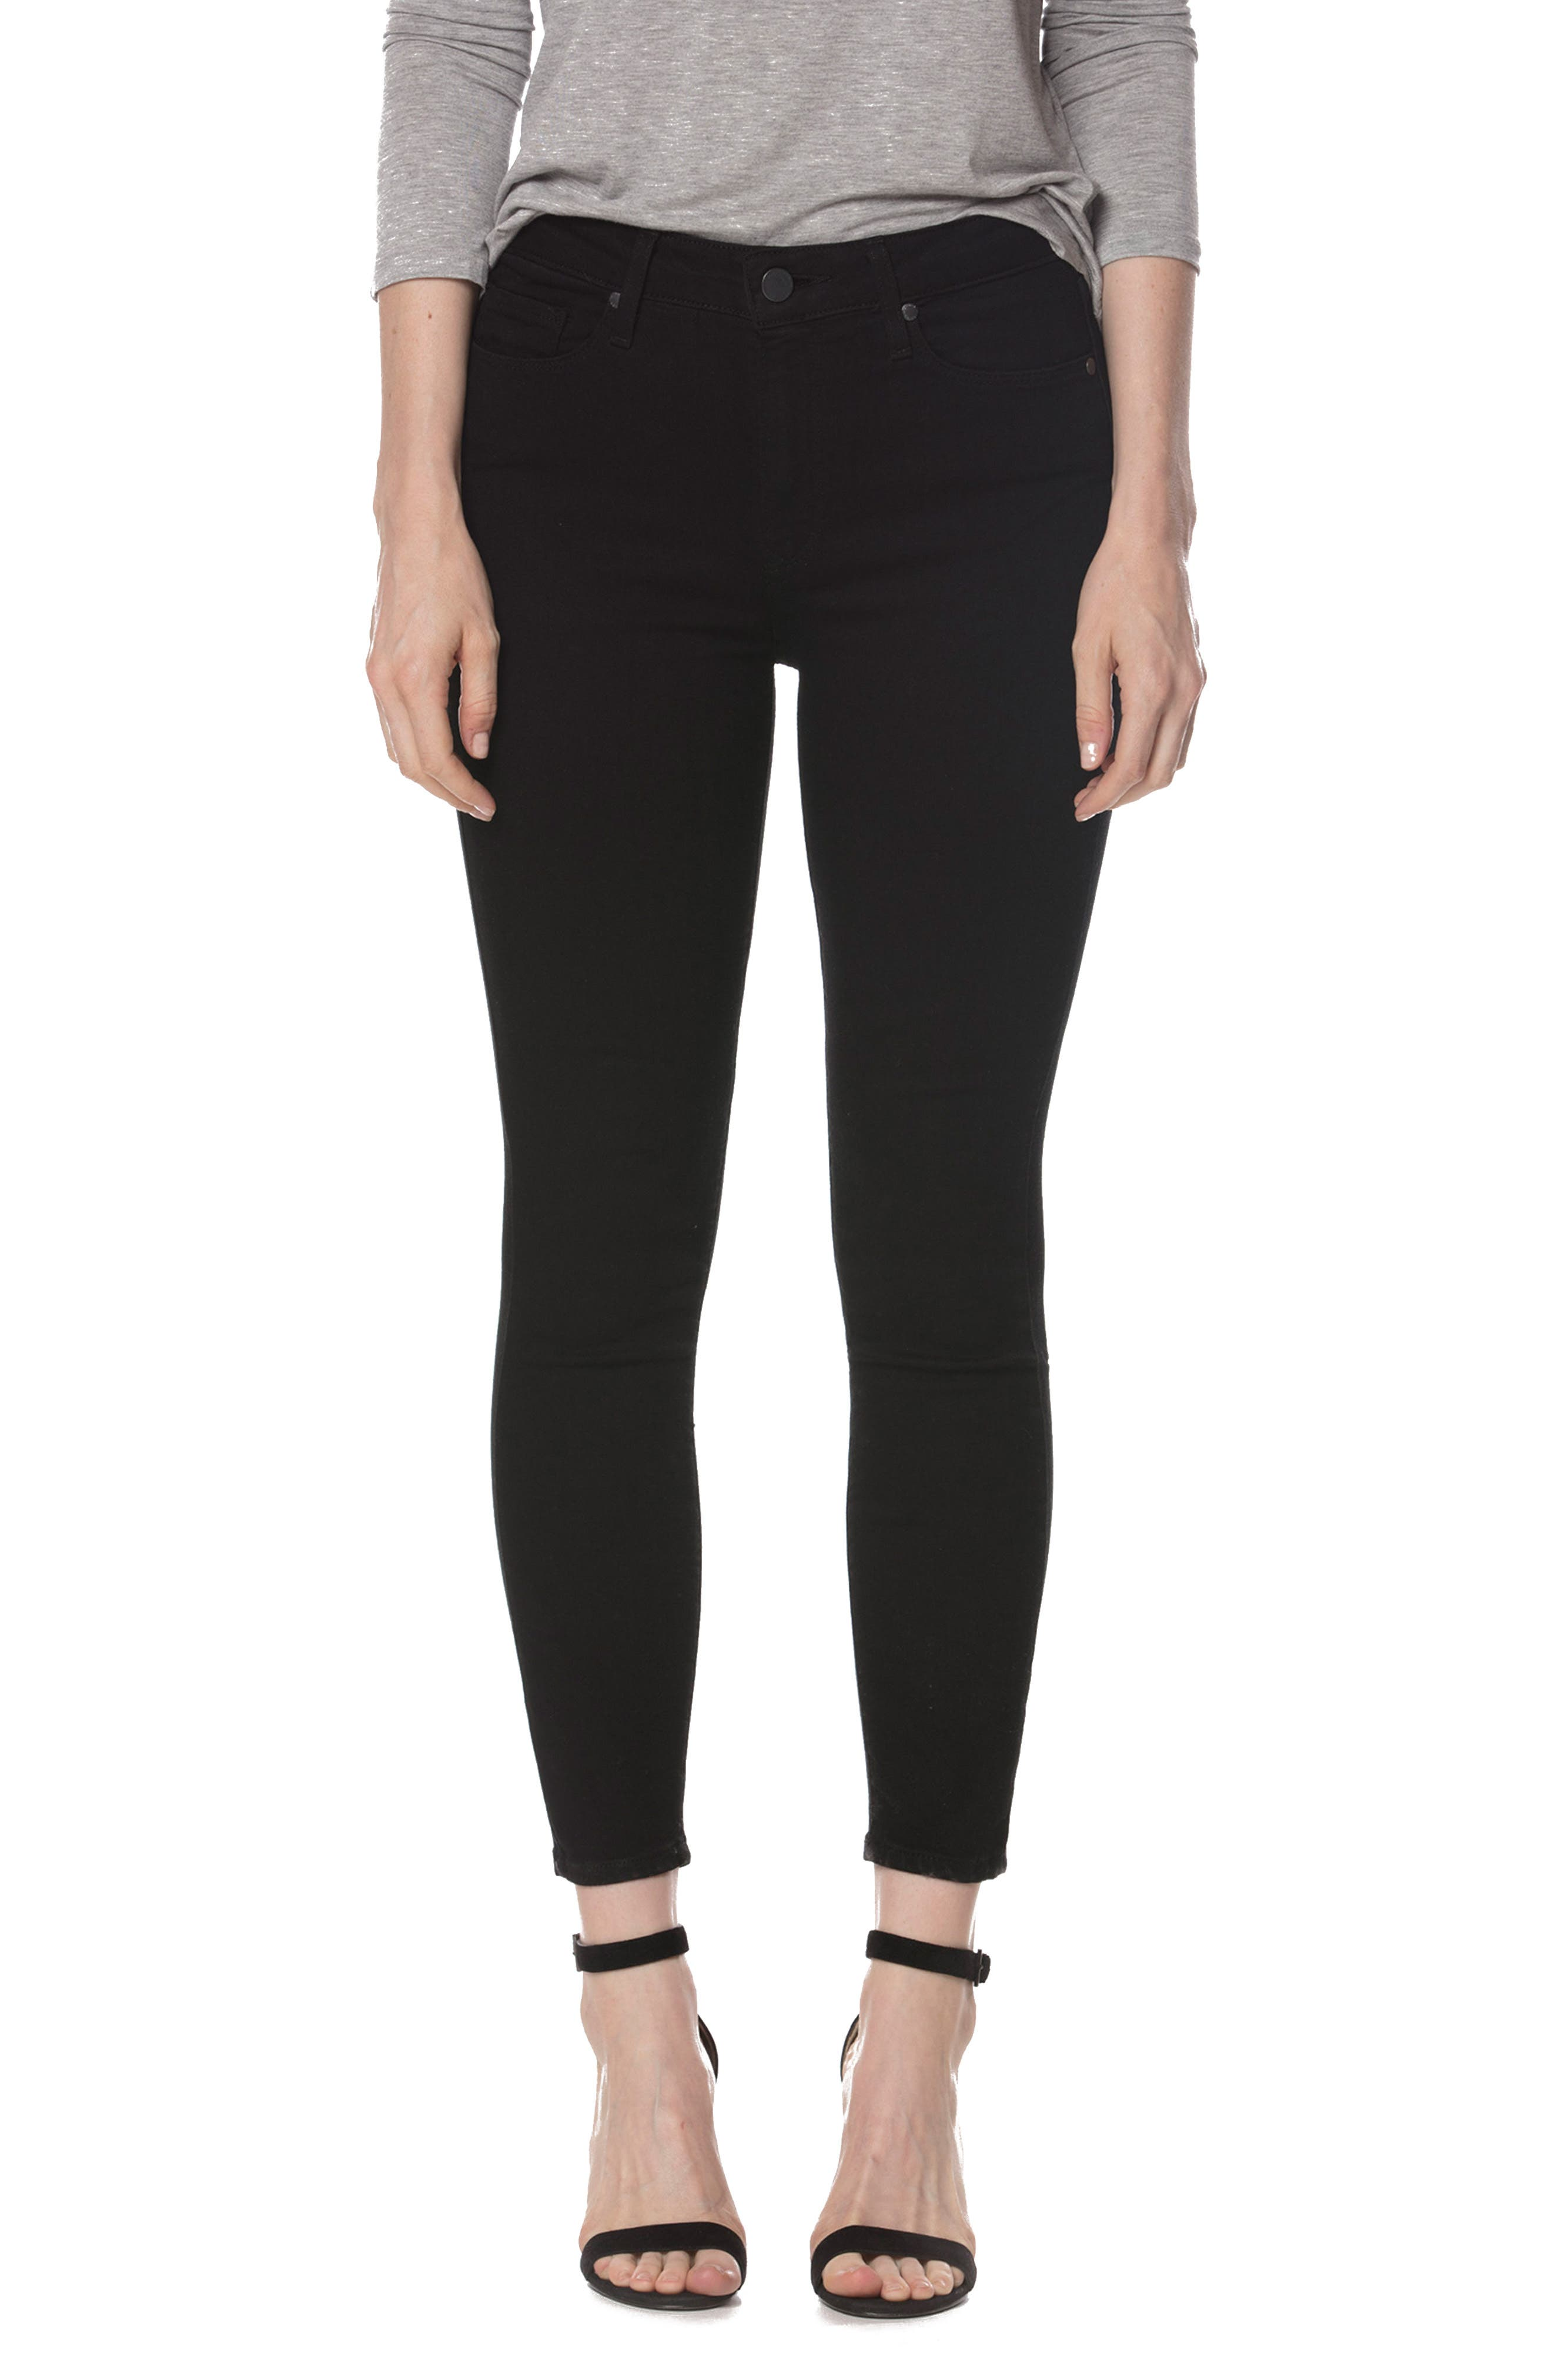 Hoxton Transcend High Waist Crop Skinny Jeans,                         Main,                         color, Black Shadow